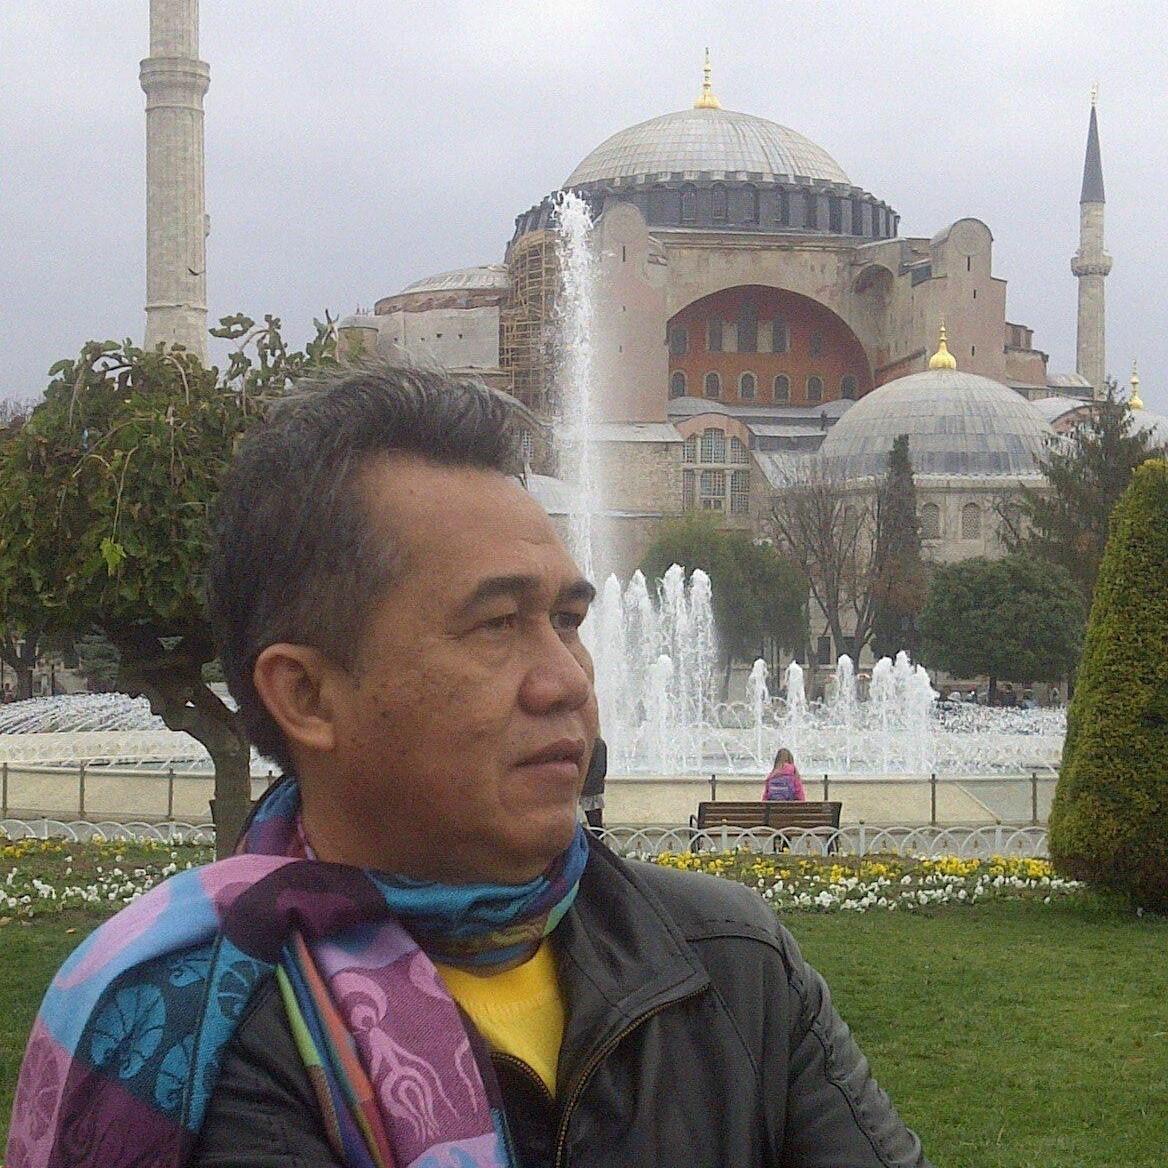 Reiner Emyot Ointoe